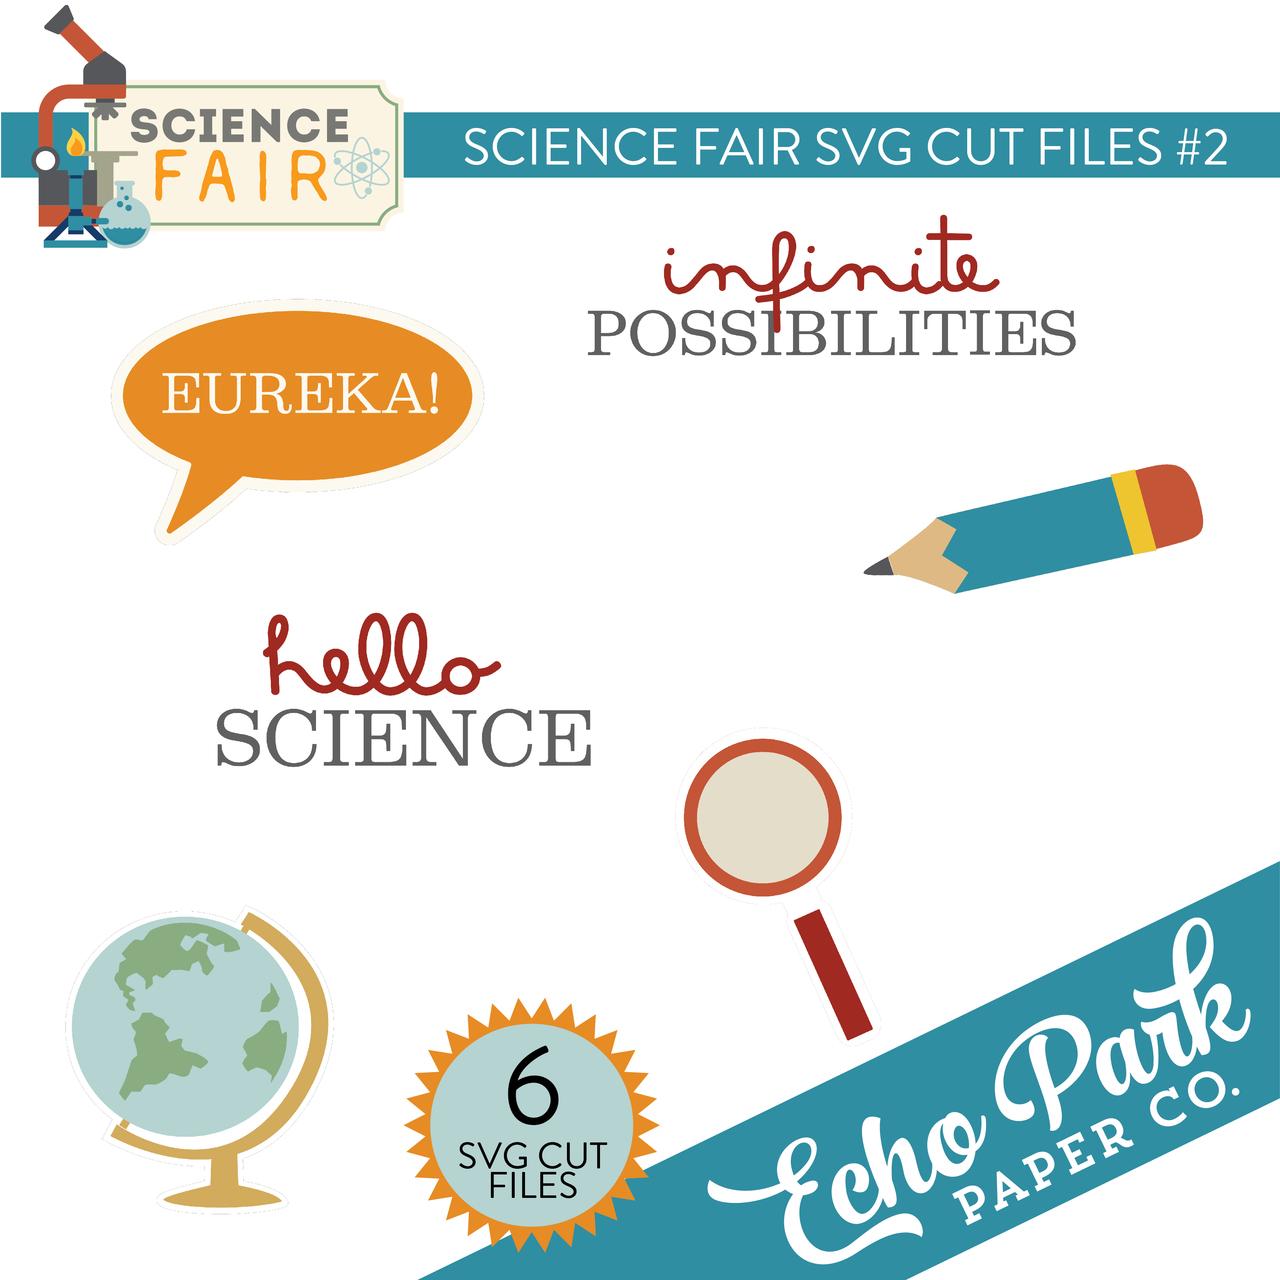 Science Fair SVG Cut Files #2